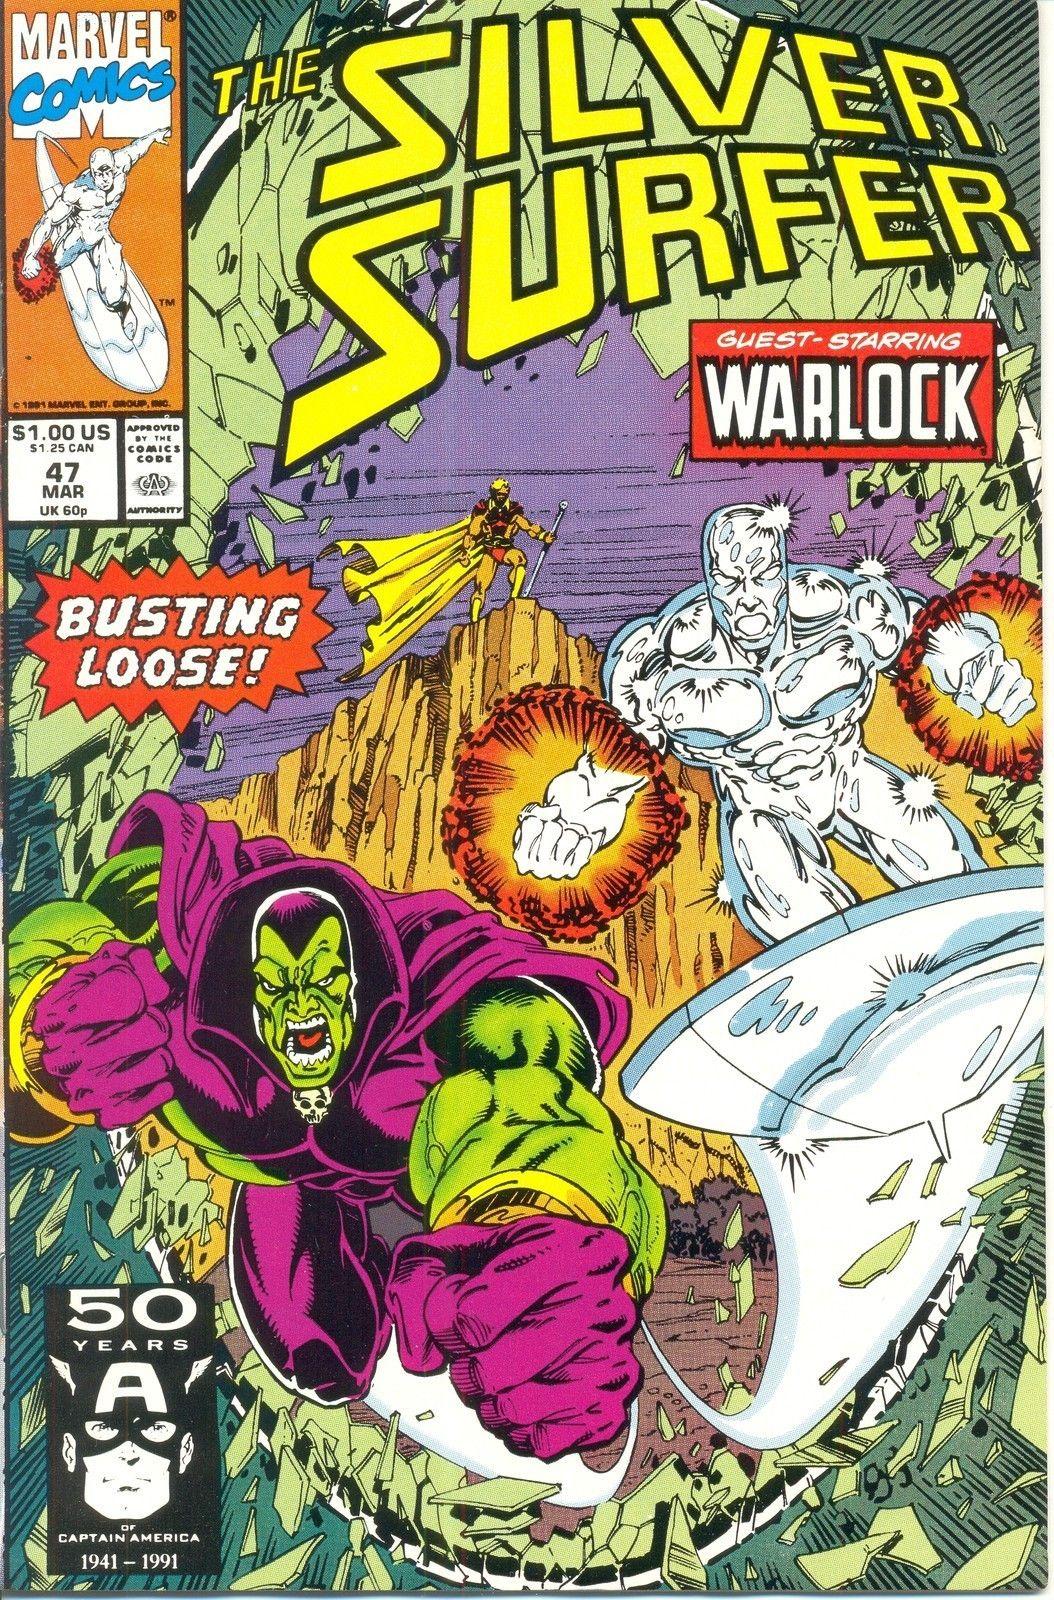 Adam Warlock Tumblr Silver surfer, Marvel comics covers